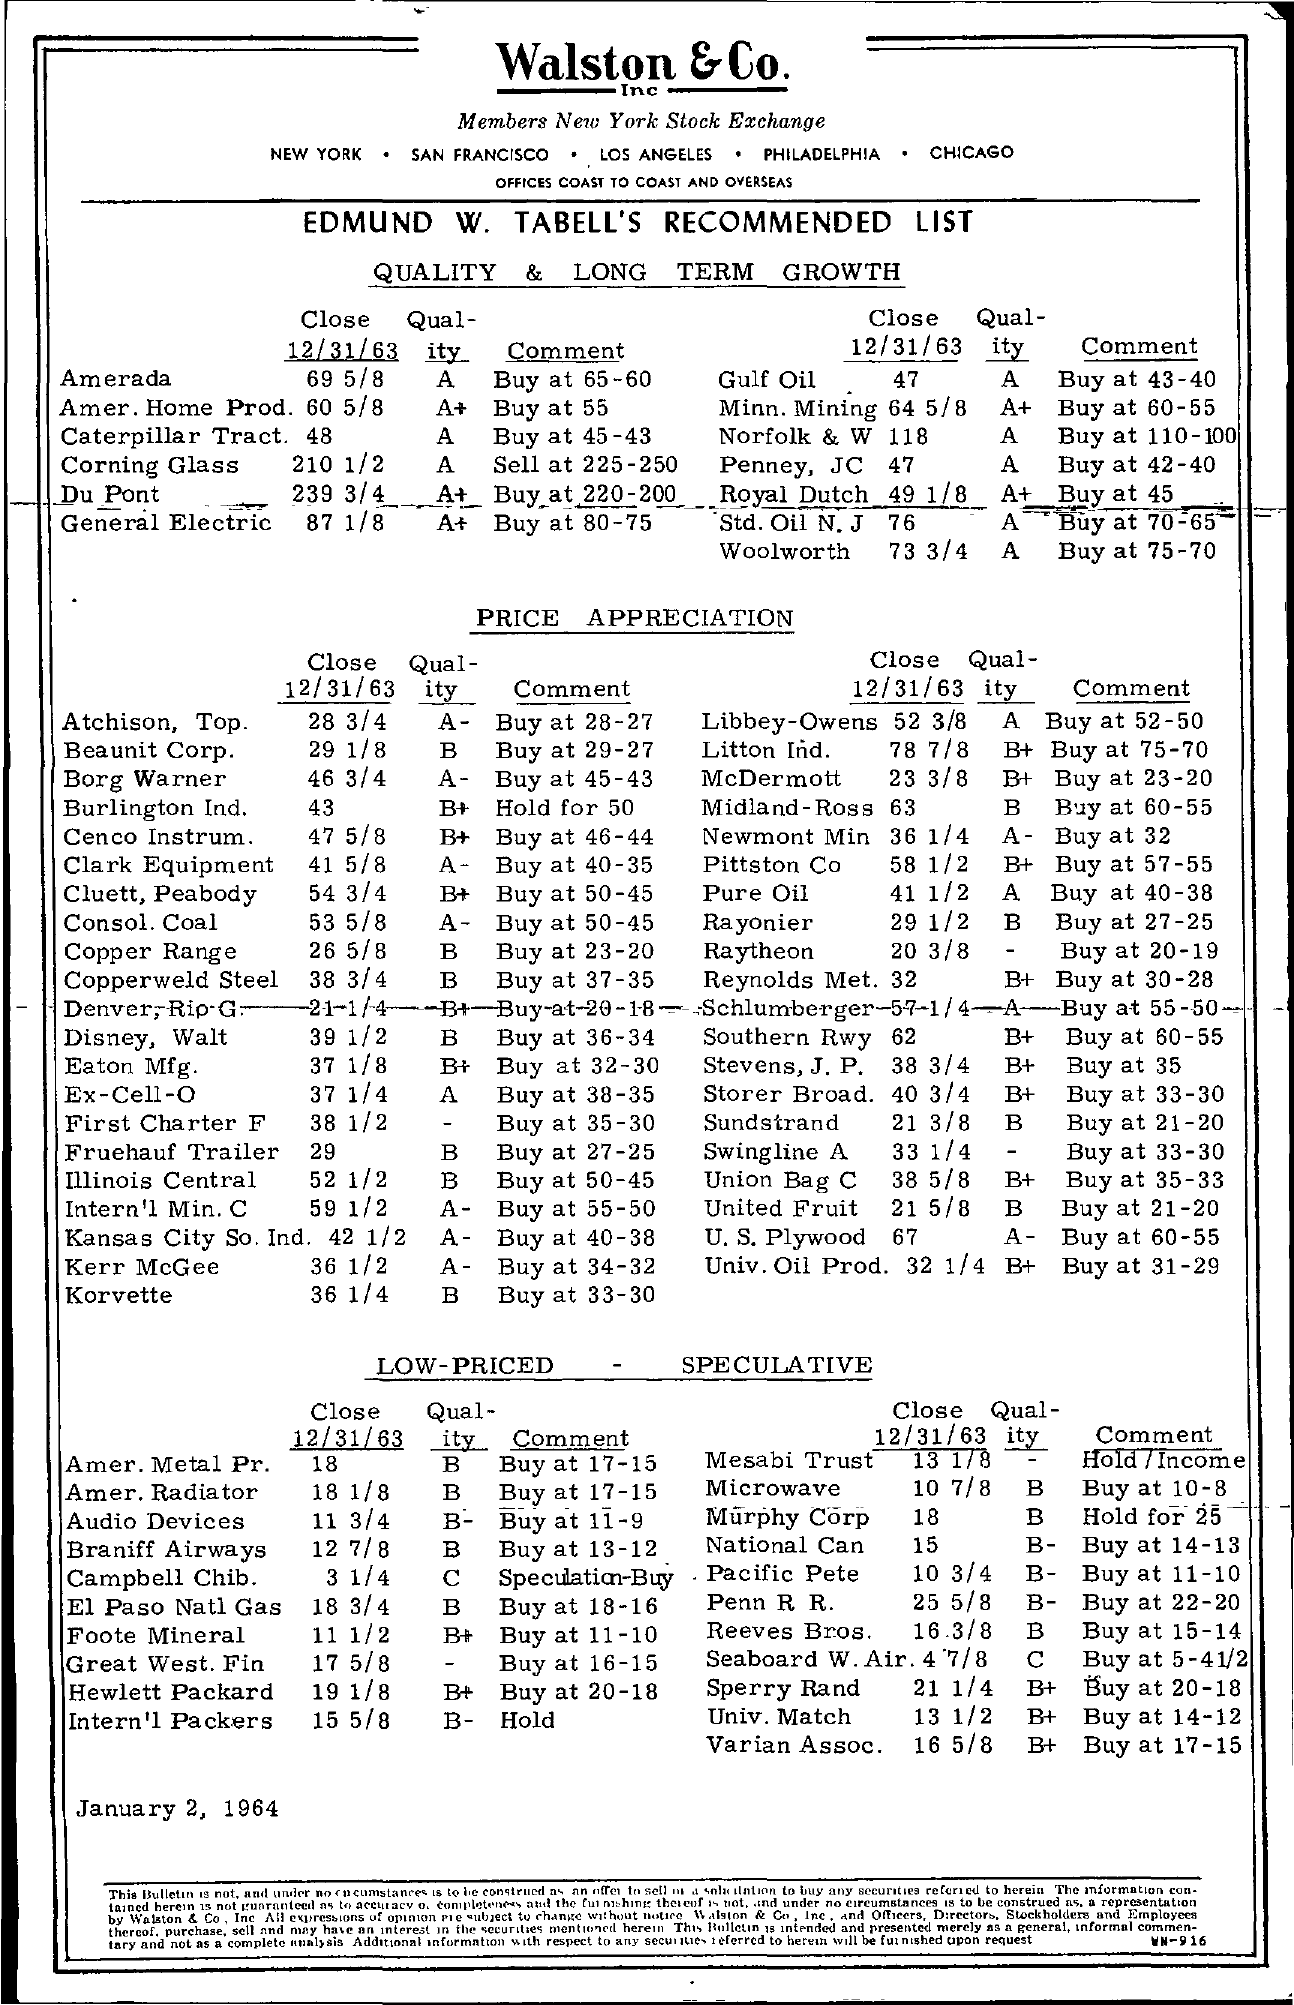 Tabell's Market Letter - January 02, 1964